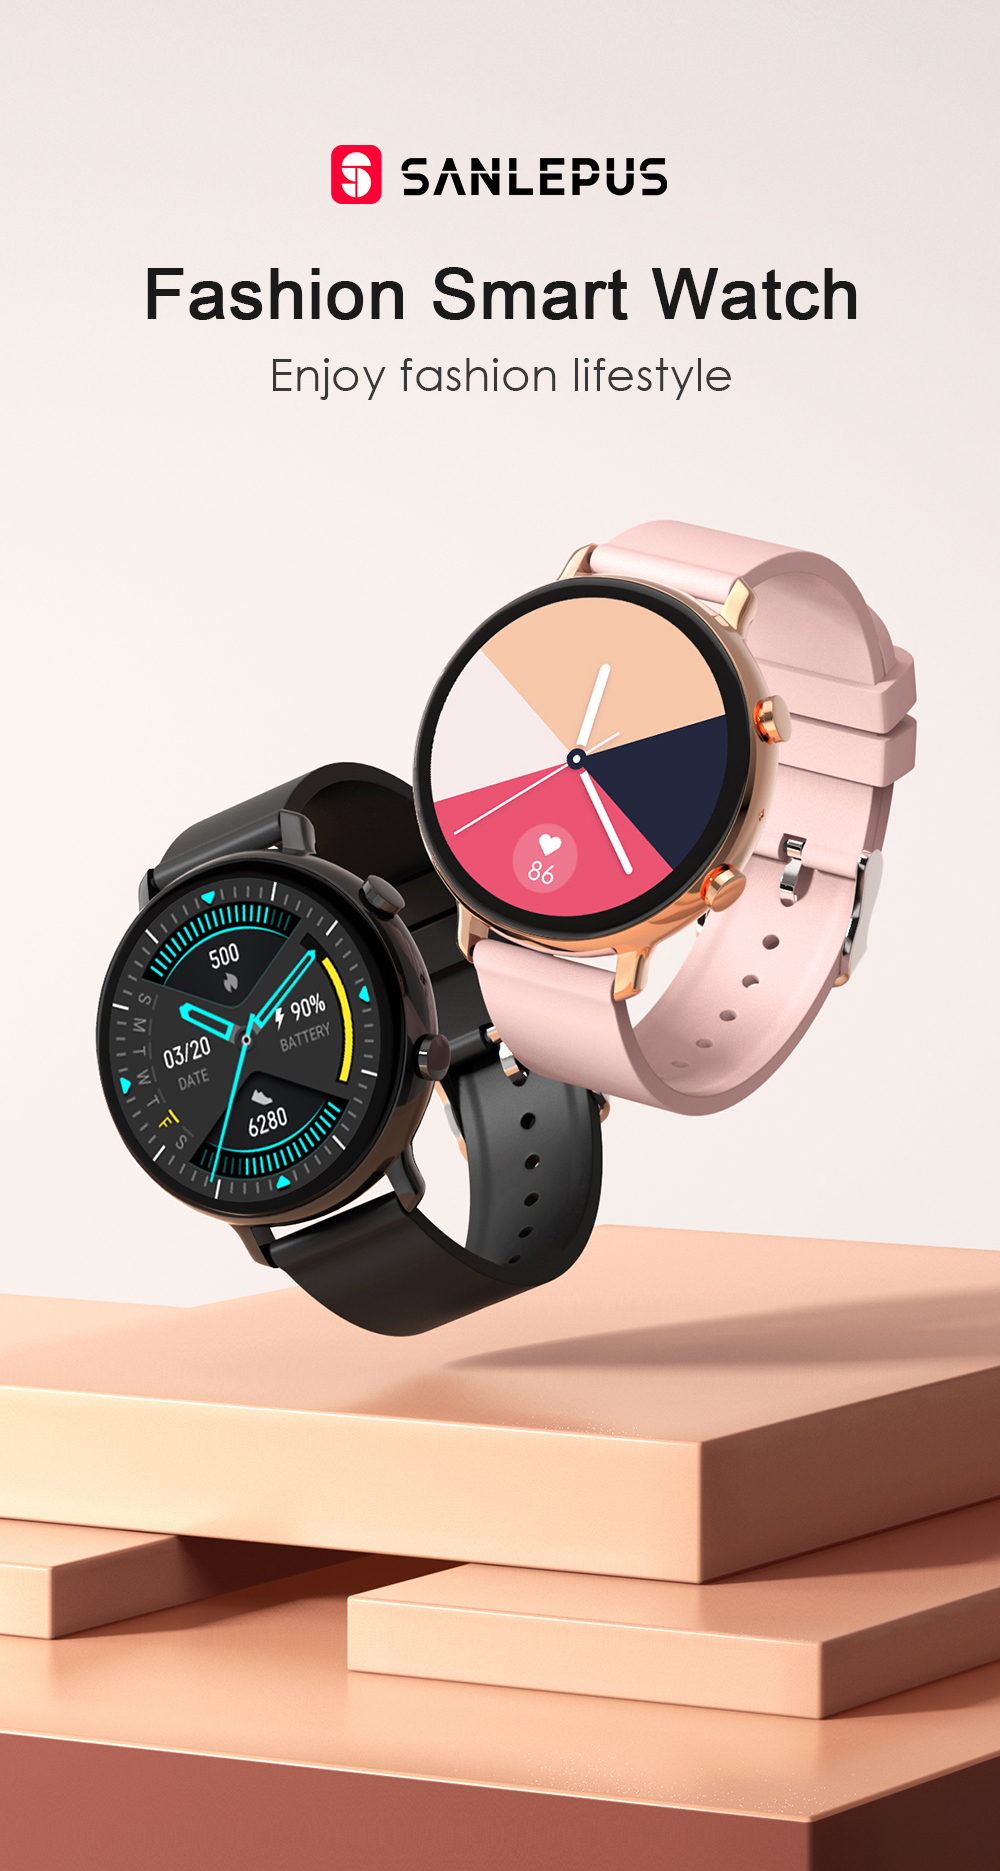 Ha741eb1a1dc5449cad776f43af17810aM SANLEPUS 2021 Smart Watch Dial Calls Men Women Waterproof Smartwatch ECG PPG Fitness Bracelet Band For Android Apple Xiaomi